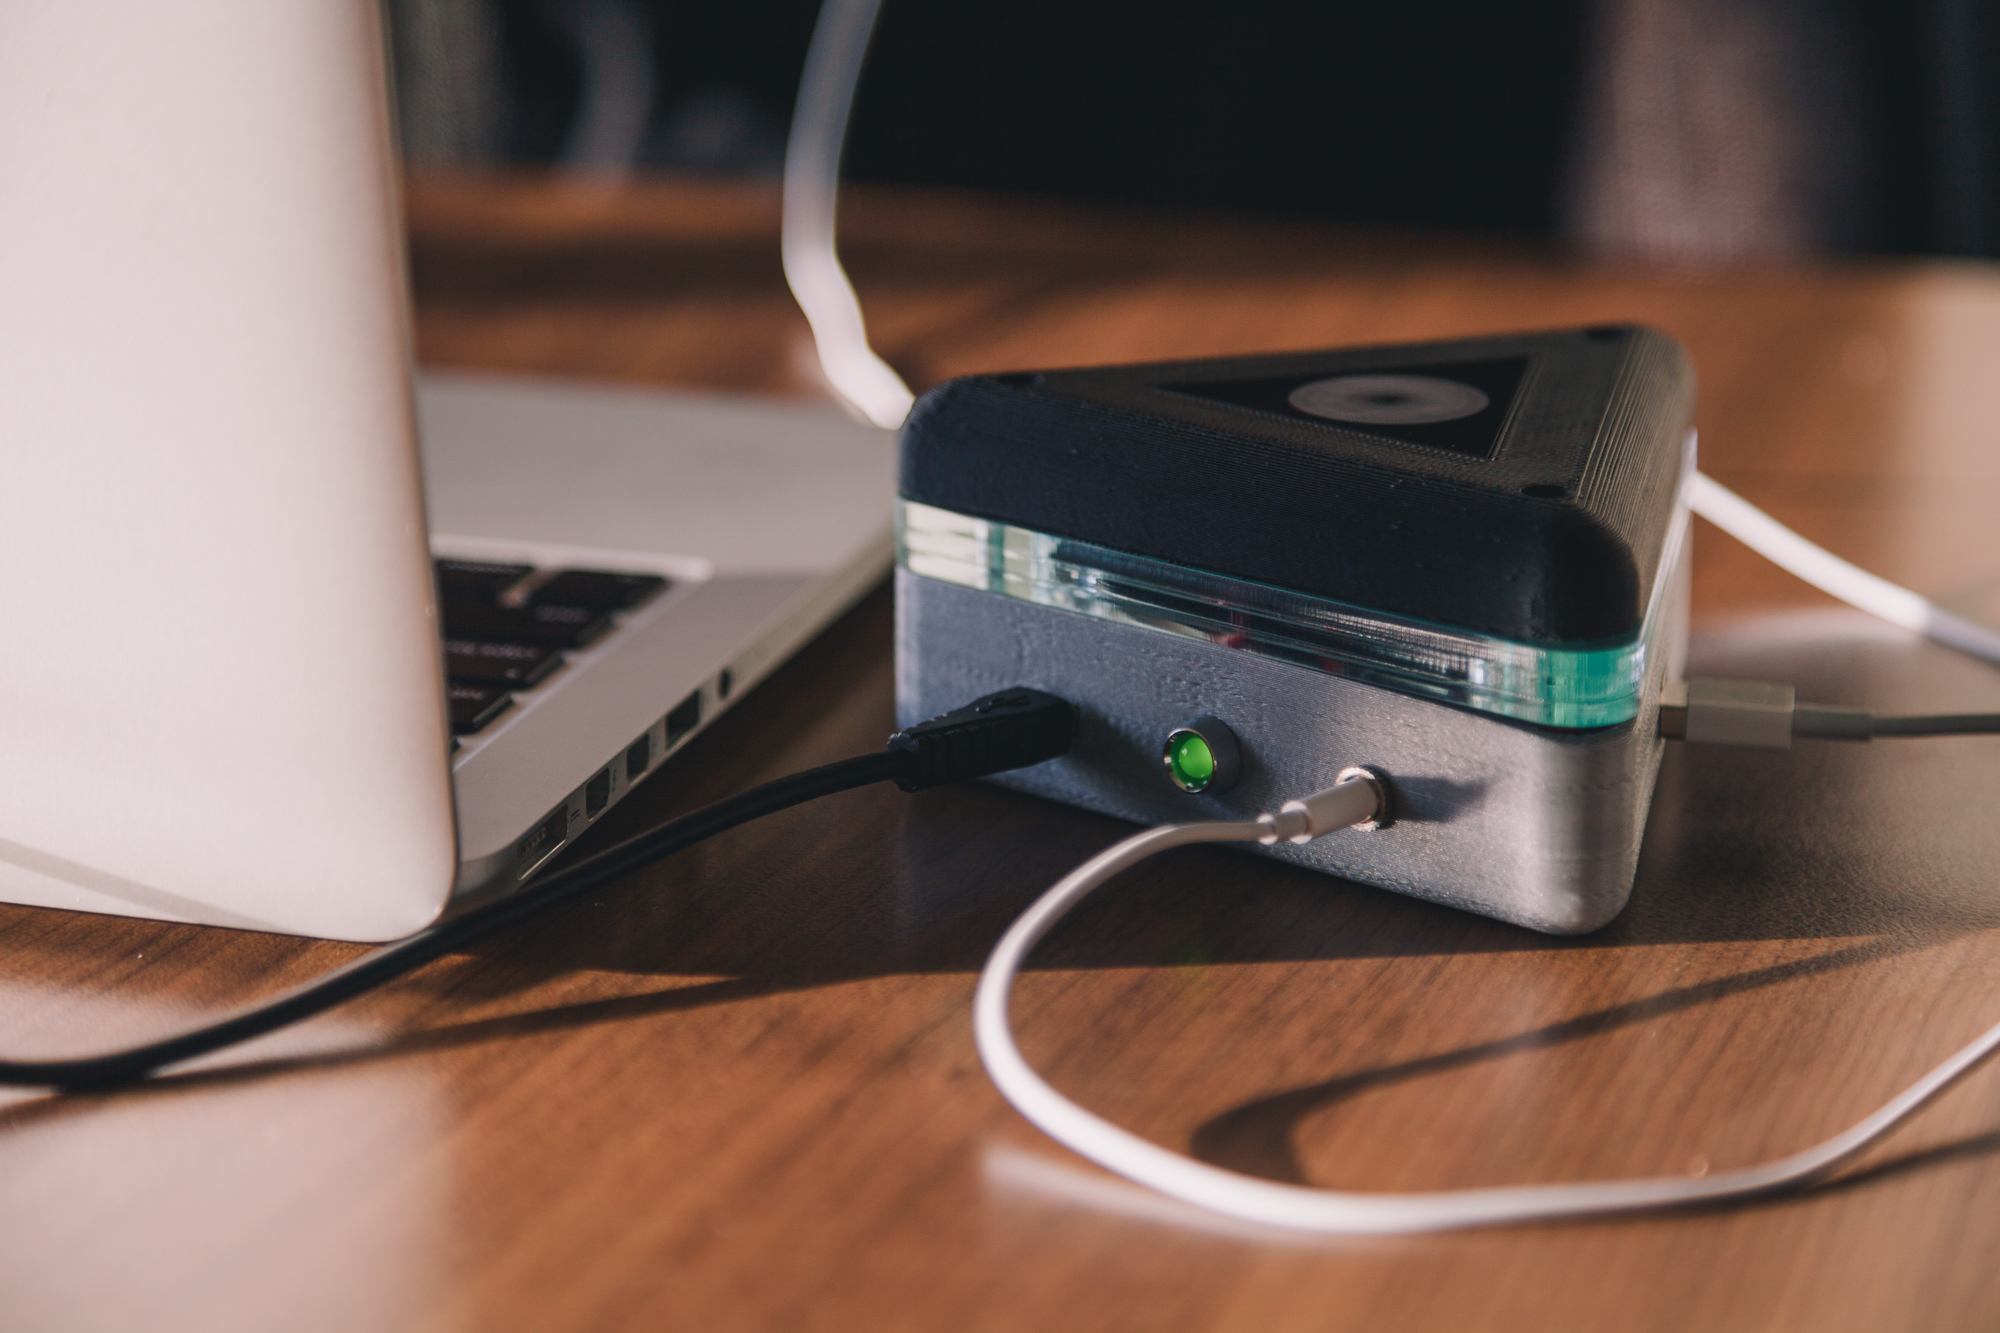 webconnectone-8.jpg